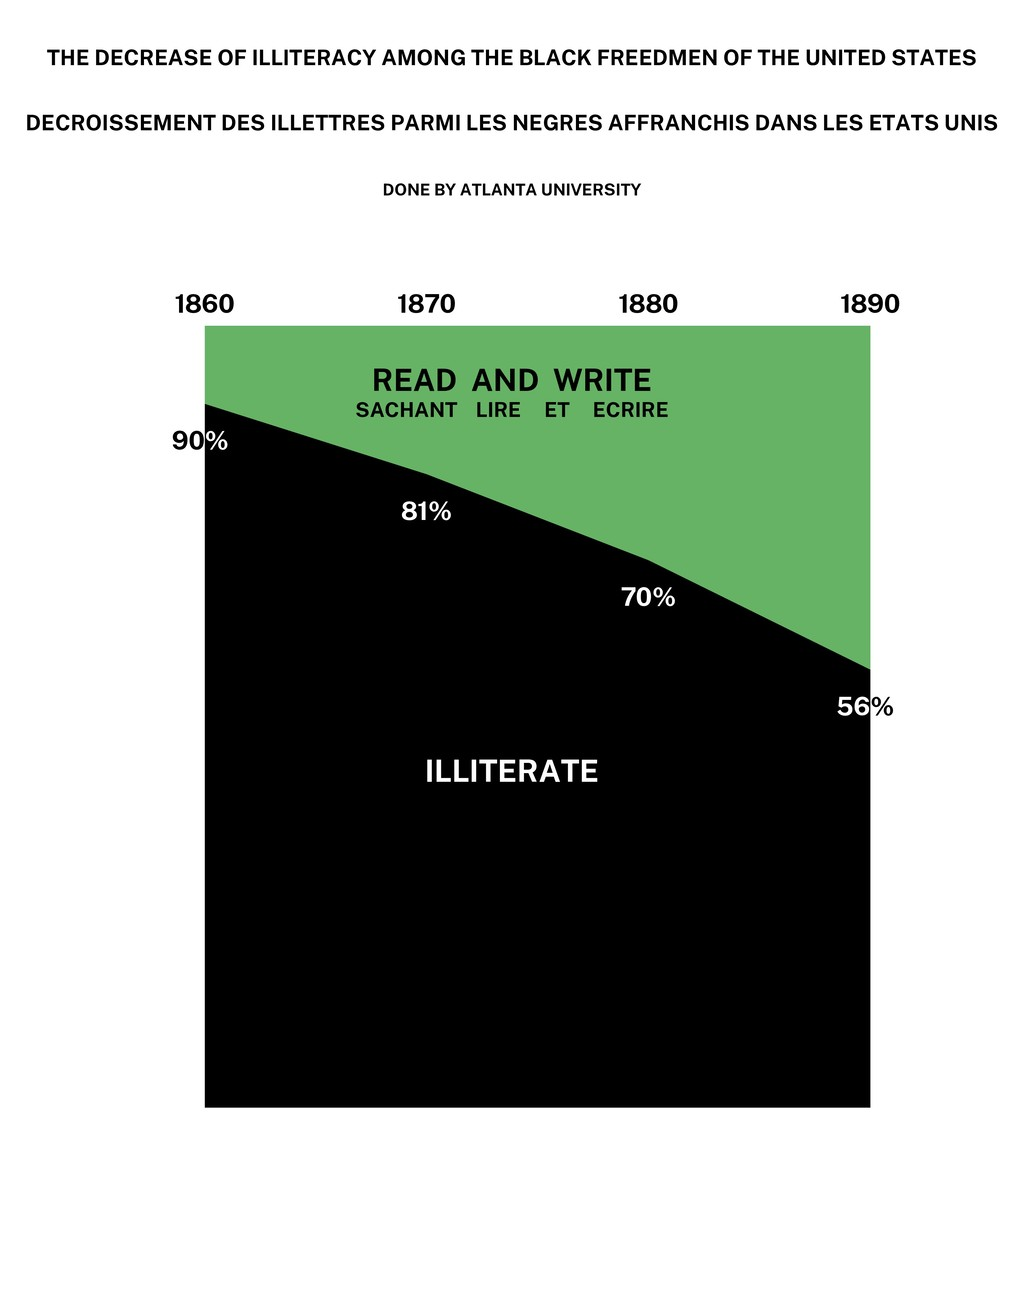 THE DECREASE OF ILLITERACY AMONG THE BLACK FREE...